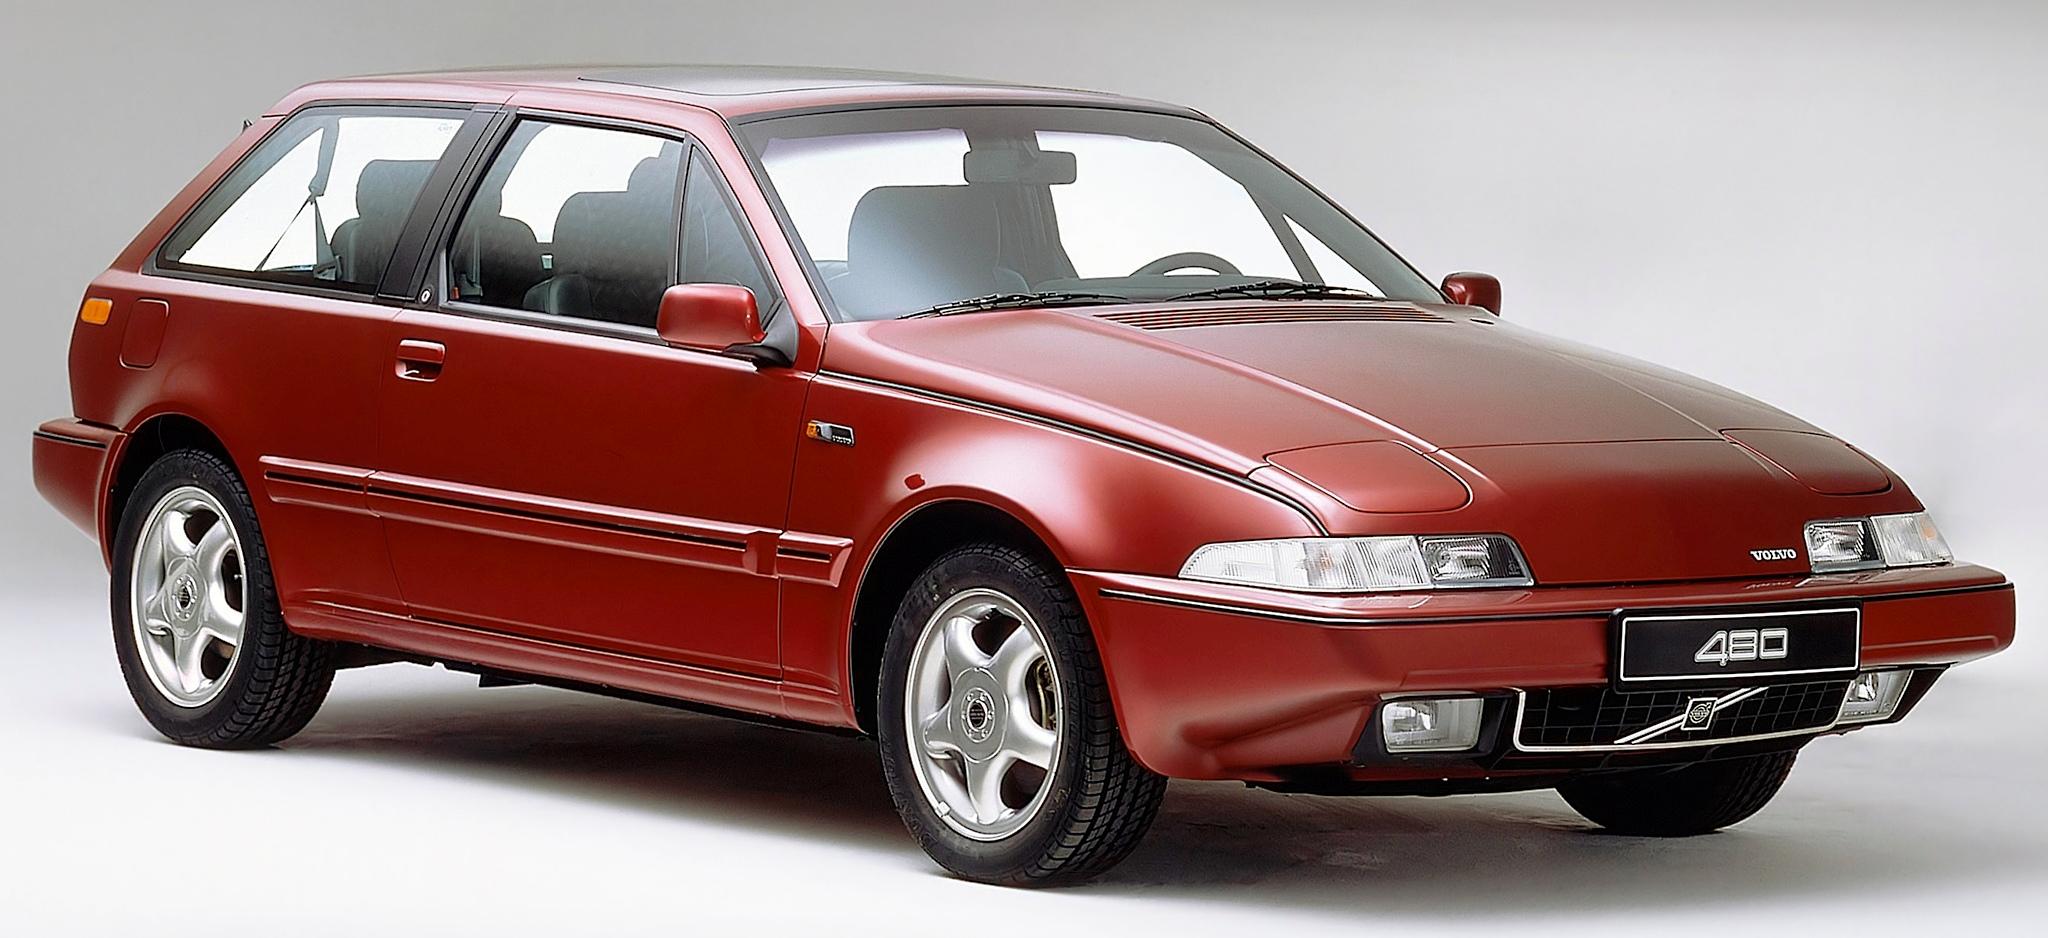 Volvo 480 1986 - 1996 Coupe #2